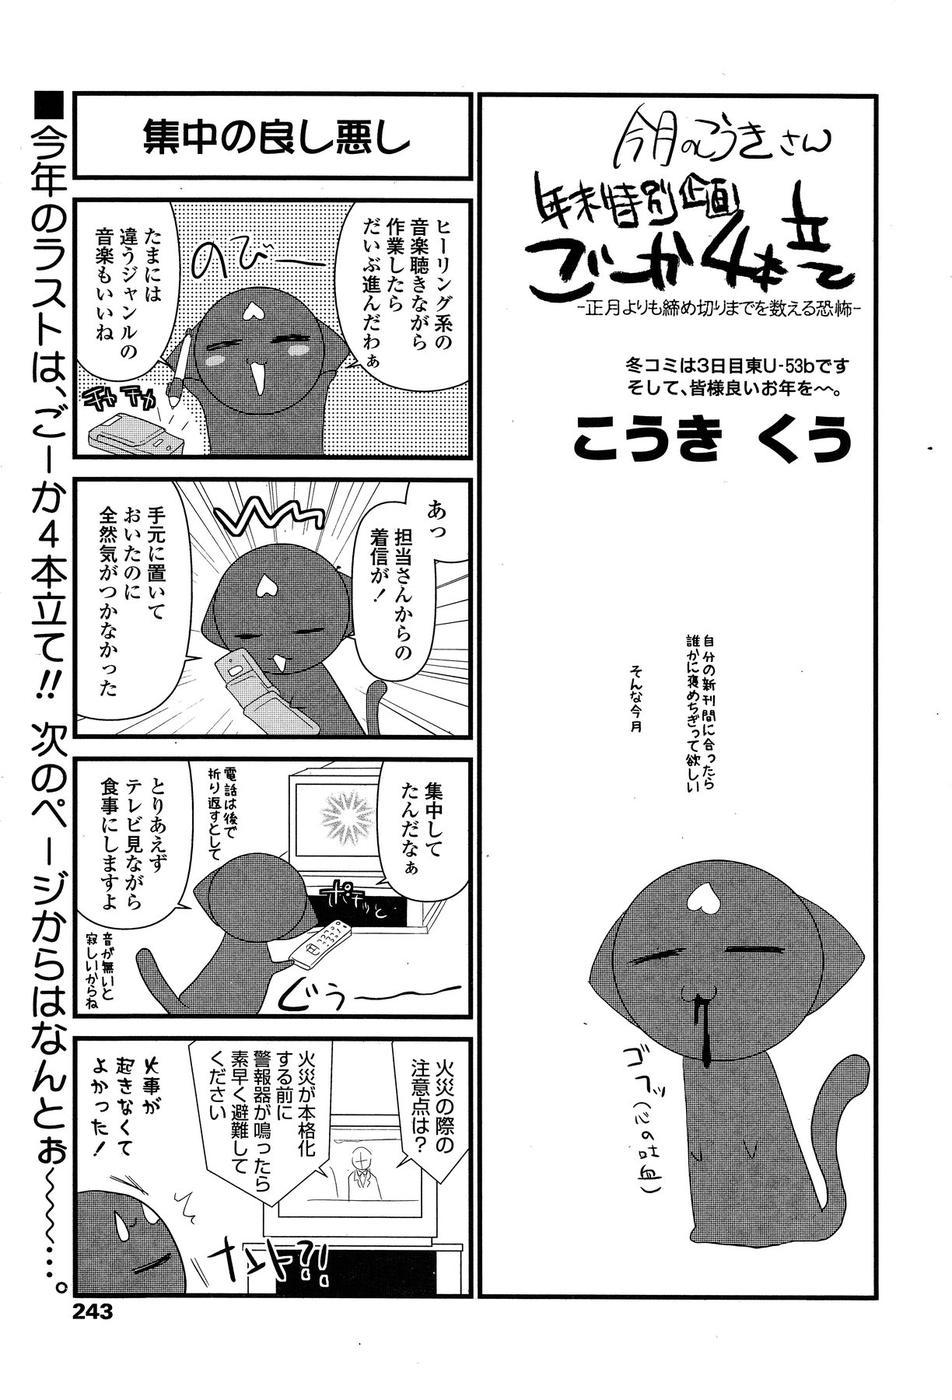 COMIC SIGMA 2009-01 Vol.28 147